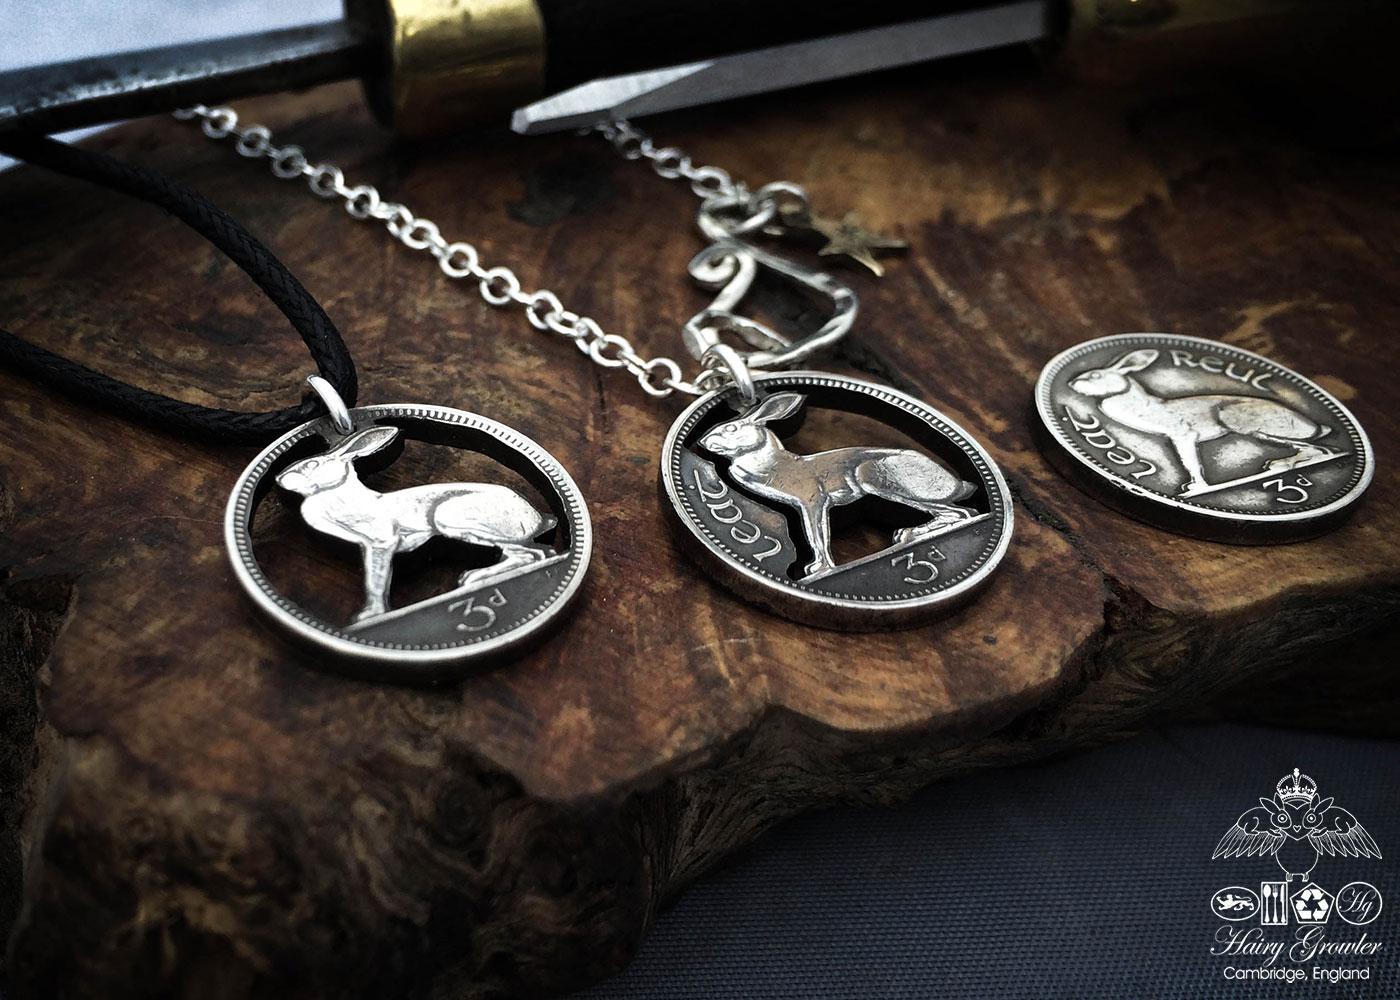 Irish hare coin jewellery. Hand-cut and carved Irish hare threepence coin pendant